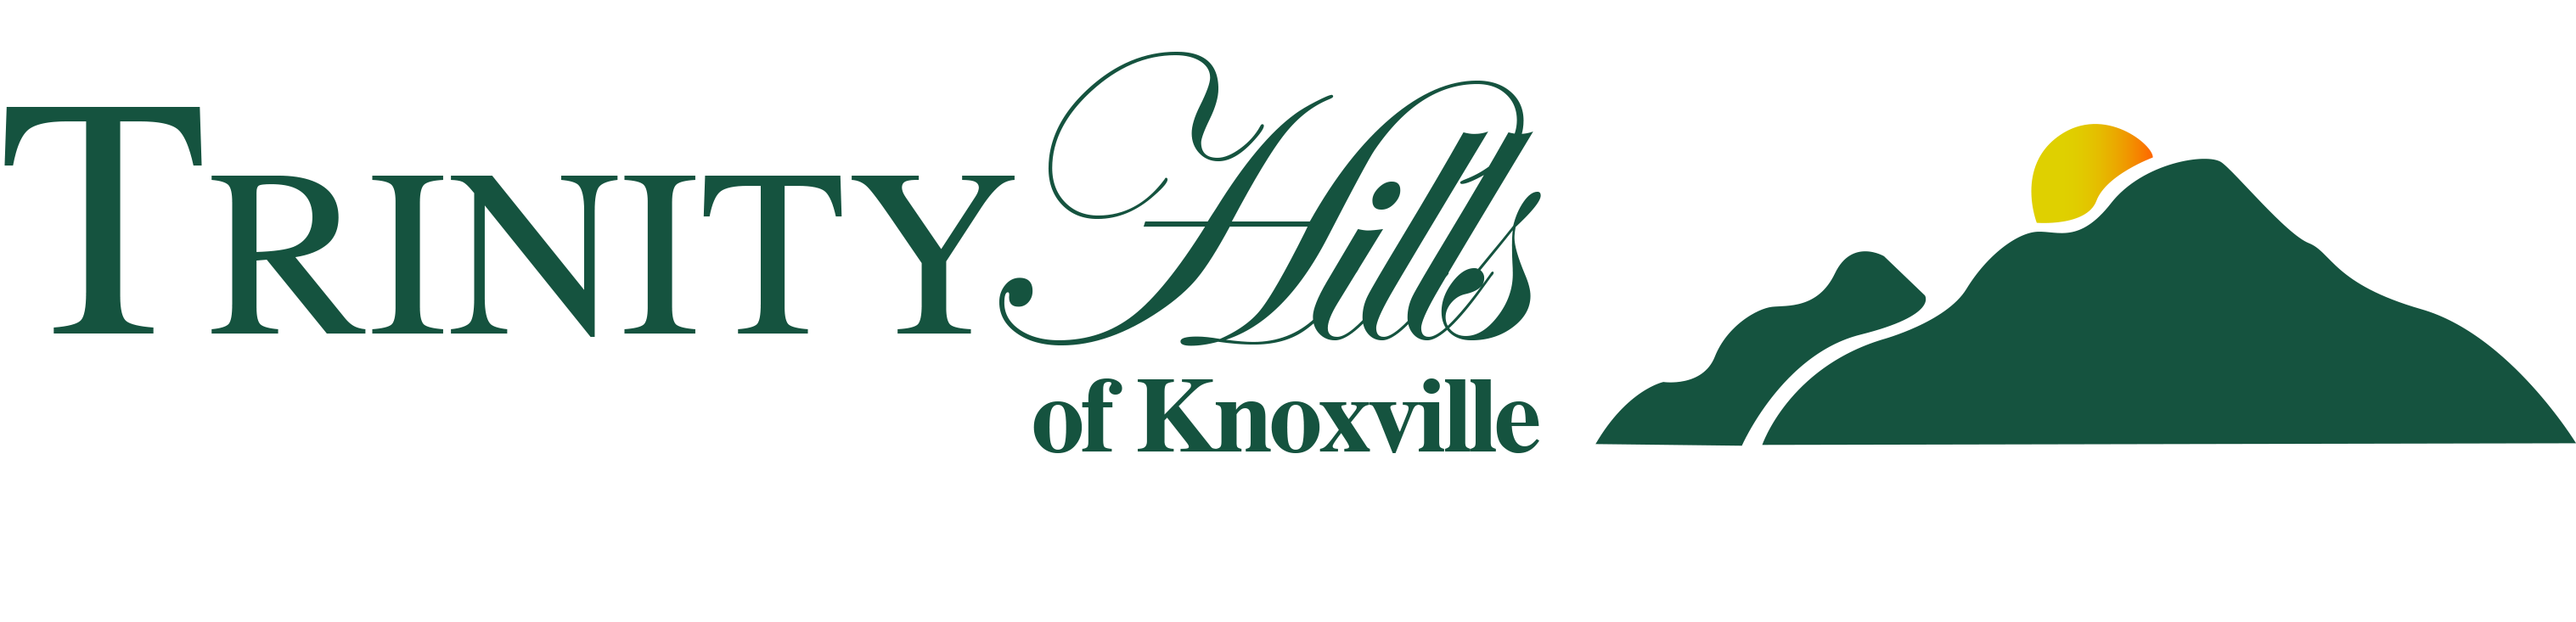 Trinity-Hills-Knoxville-Senior-Living-Logo